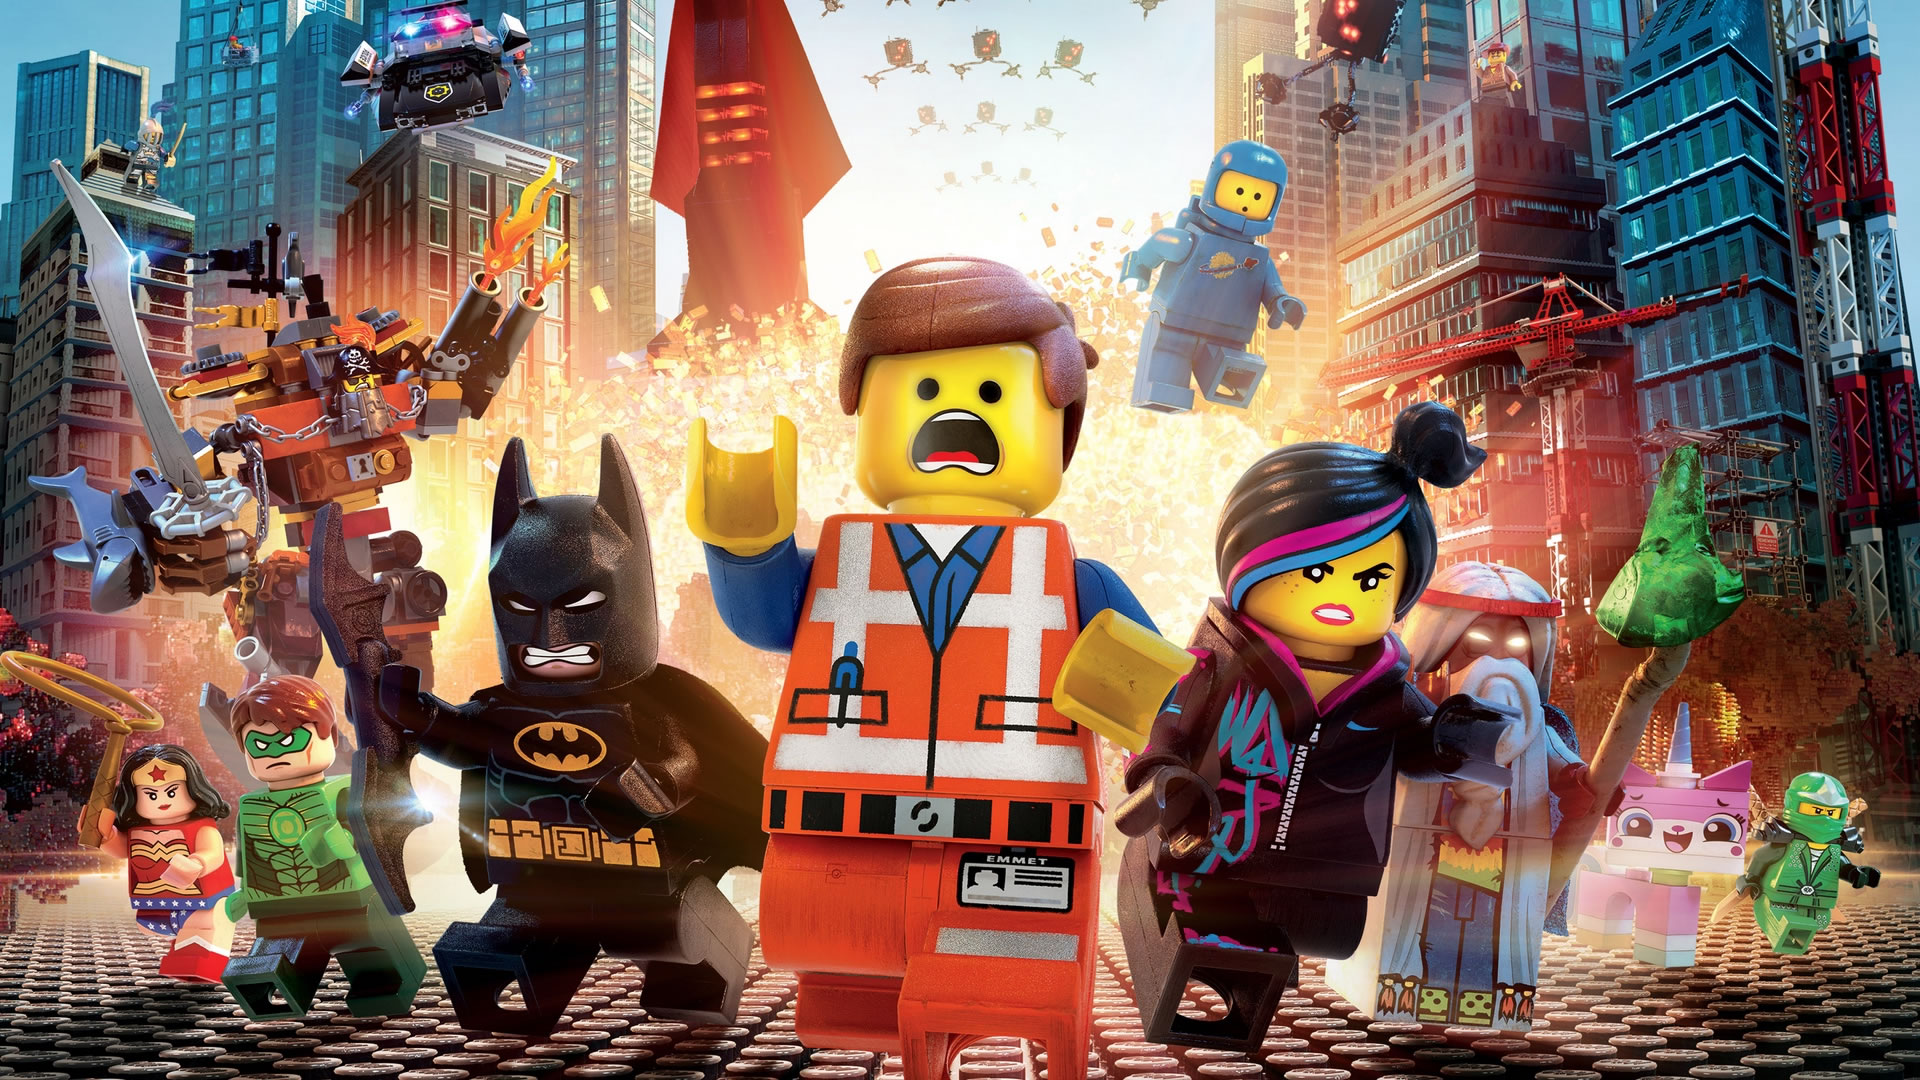 download wallpaper: LEGO Movie explosie wallpaper